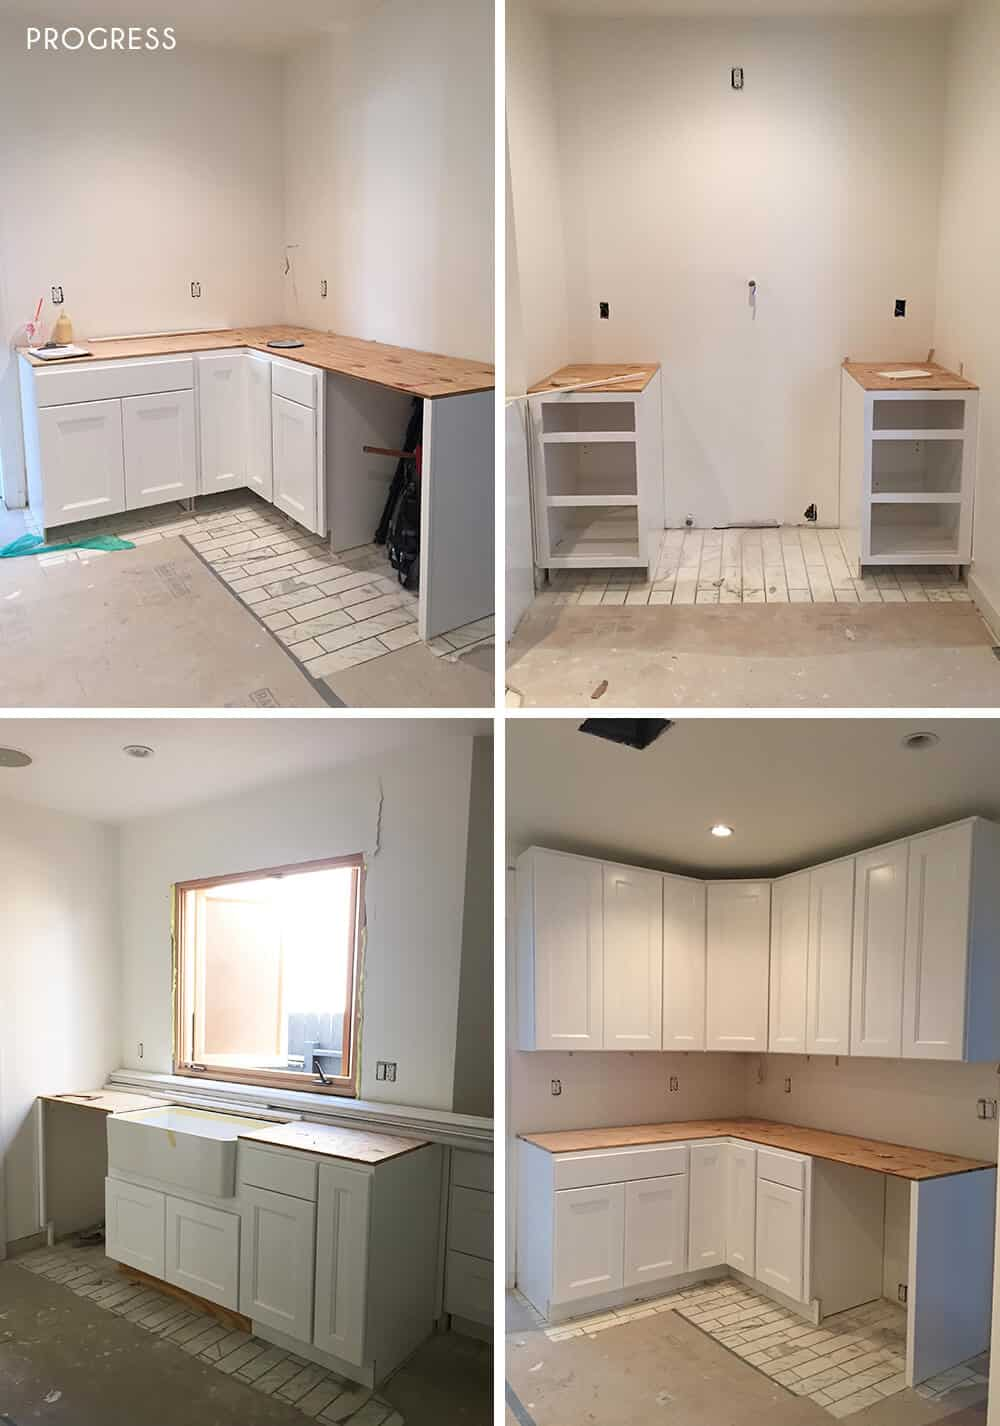 Sarah Stabuel Kitchen Progress photos Emily Henderson Design